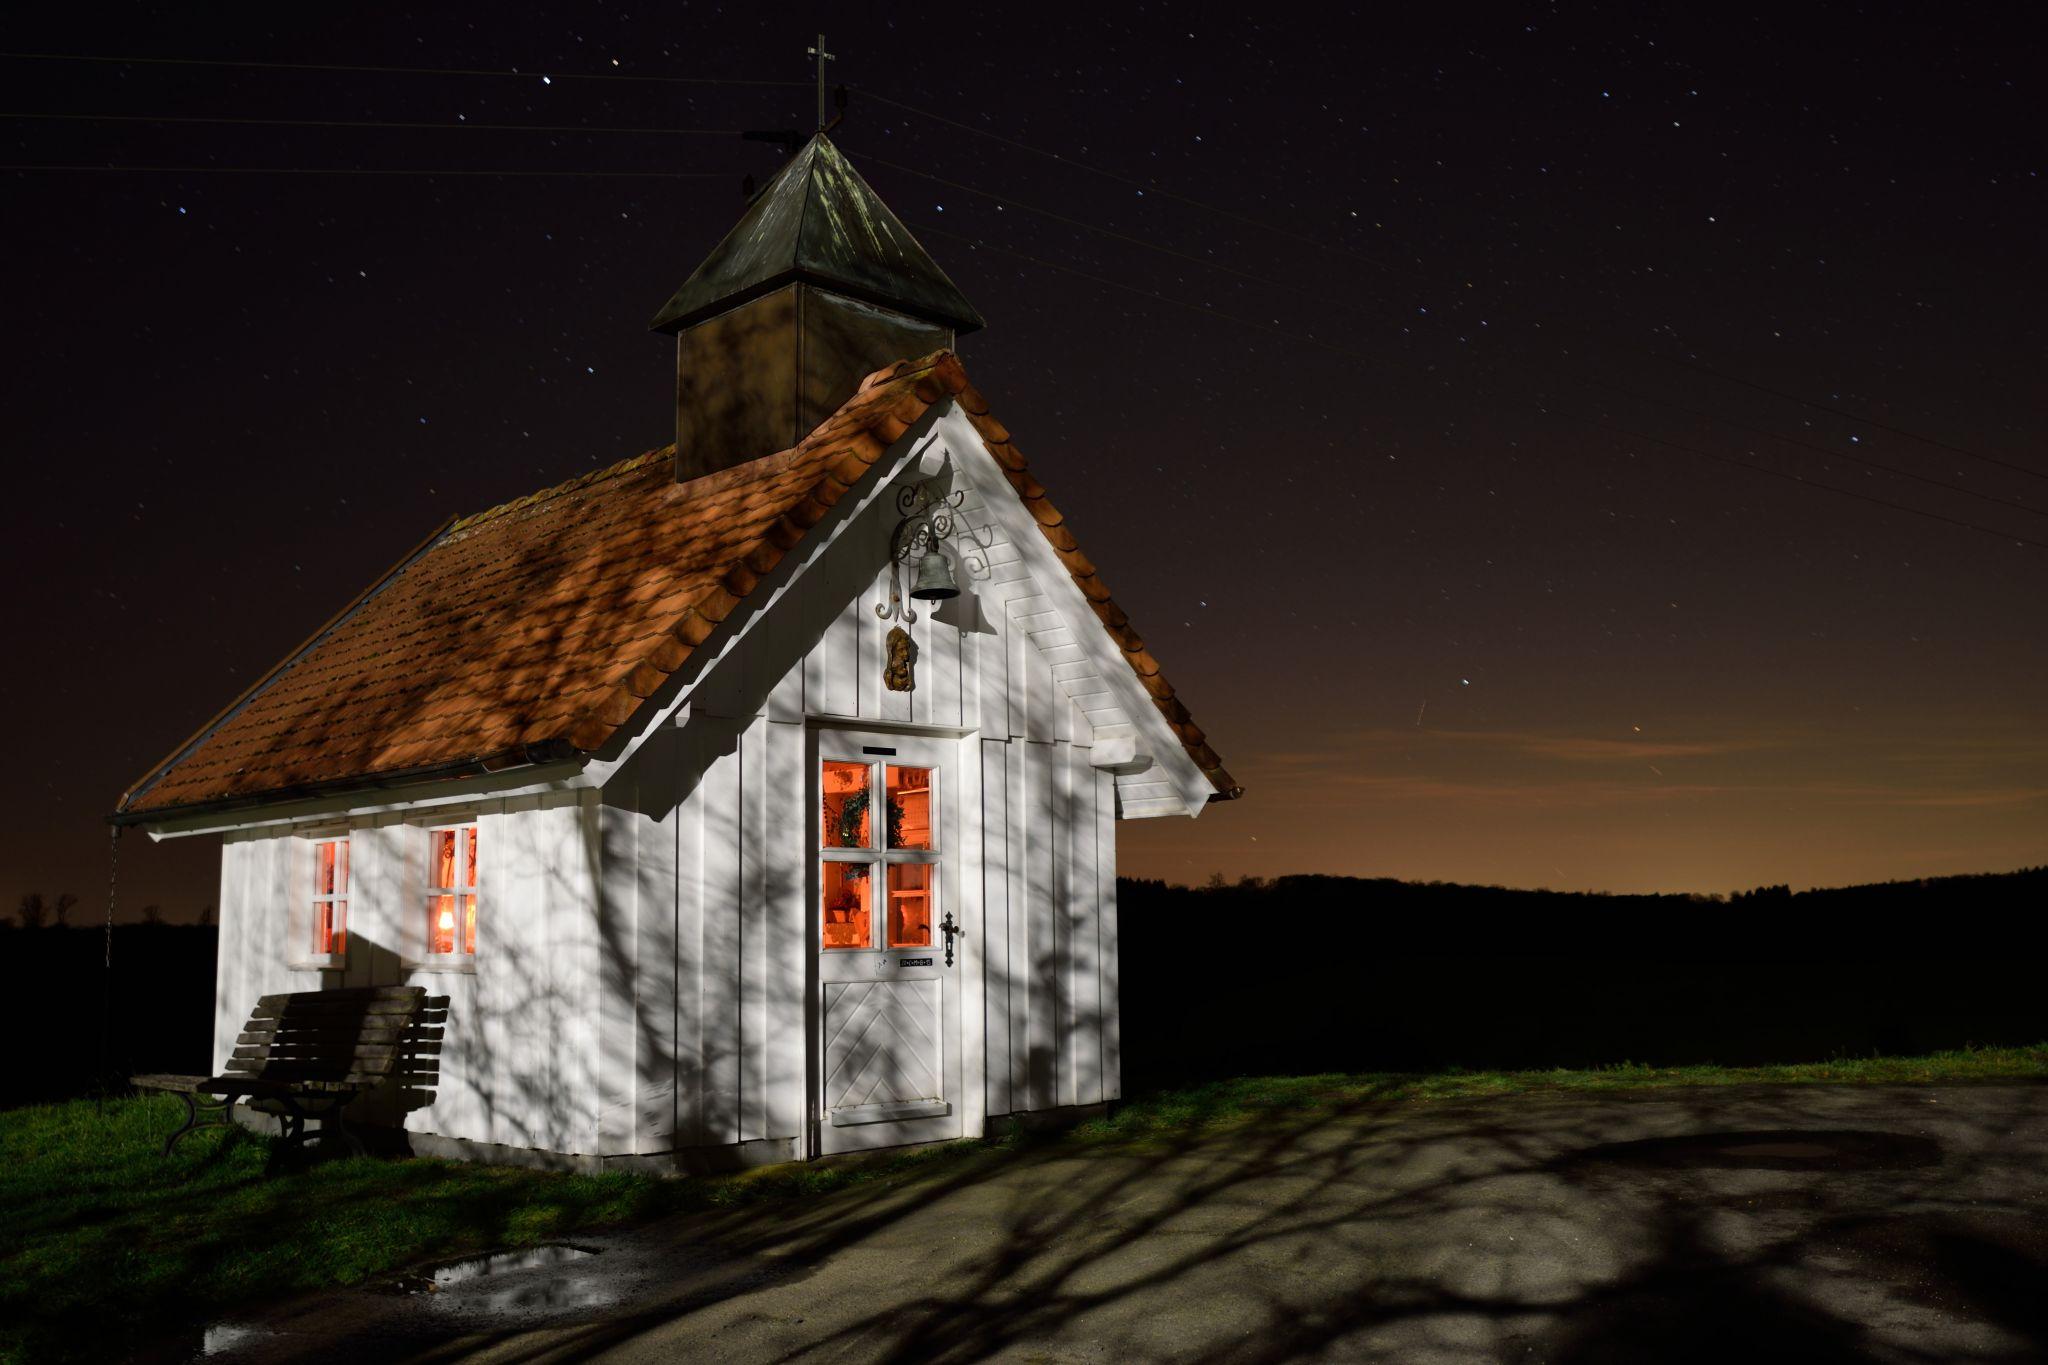 Kapelle in Solscheid, Germany